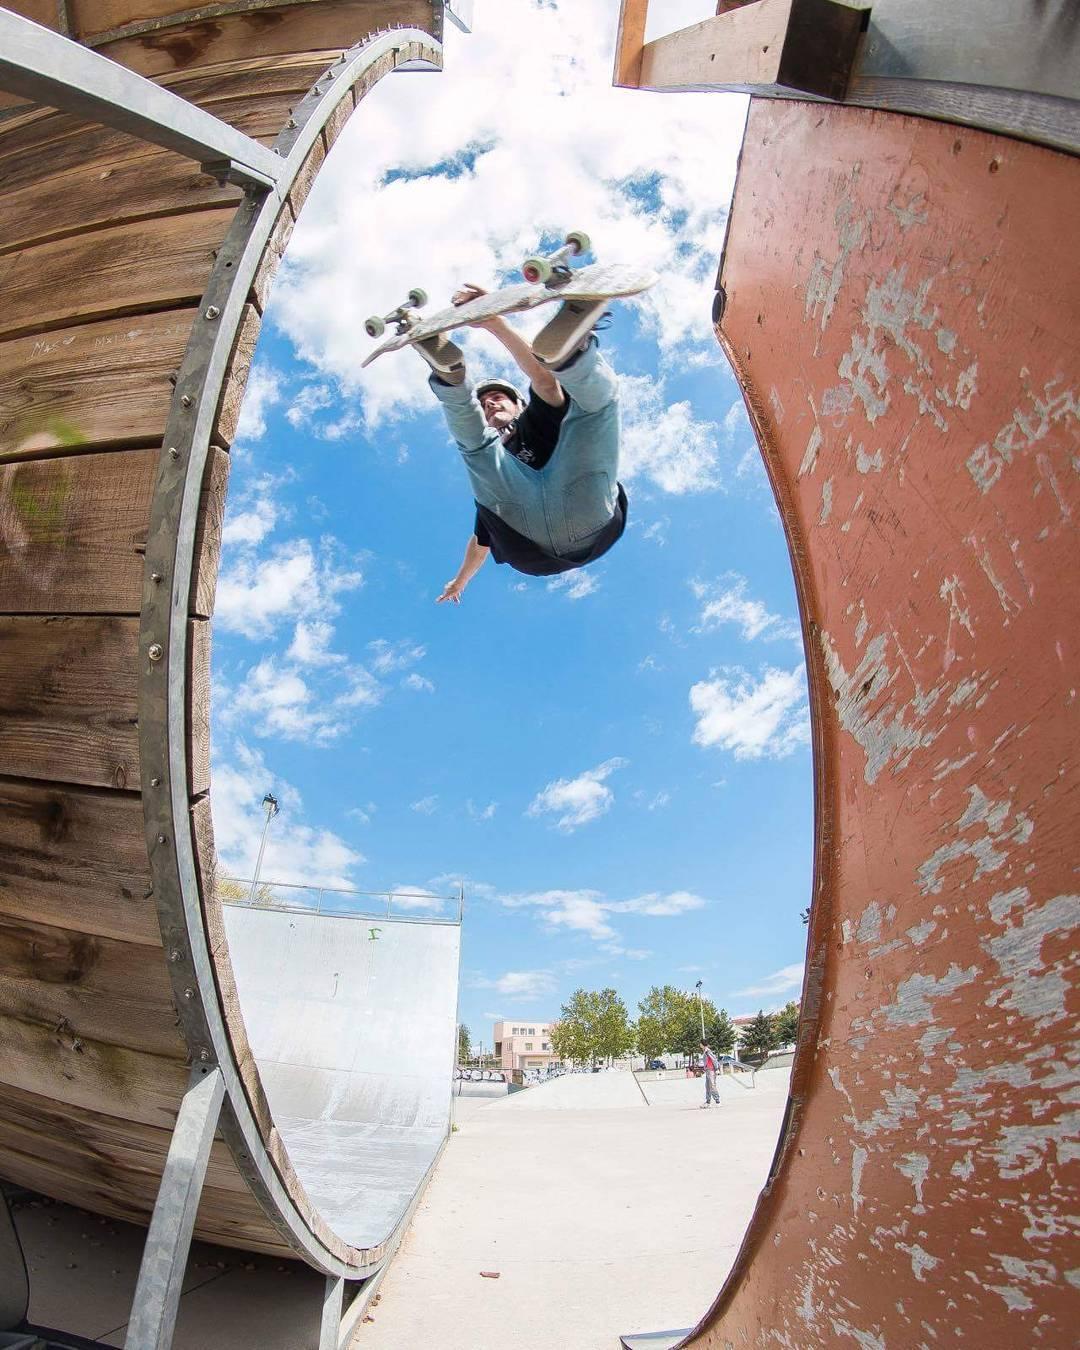 #LoadedAmbassador @guillesalva33 transferring some fun into his skateboarding account on his Loaded Kanthaka.  Photo: @e.gnarcia  #LoadedBoards #Kanthaka #Orangatang #Onsens